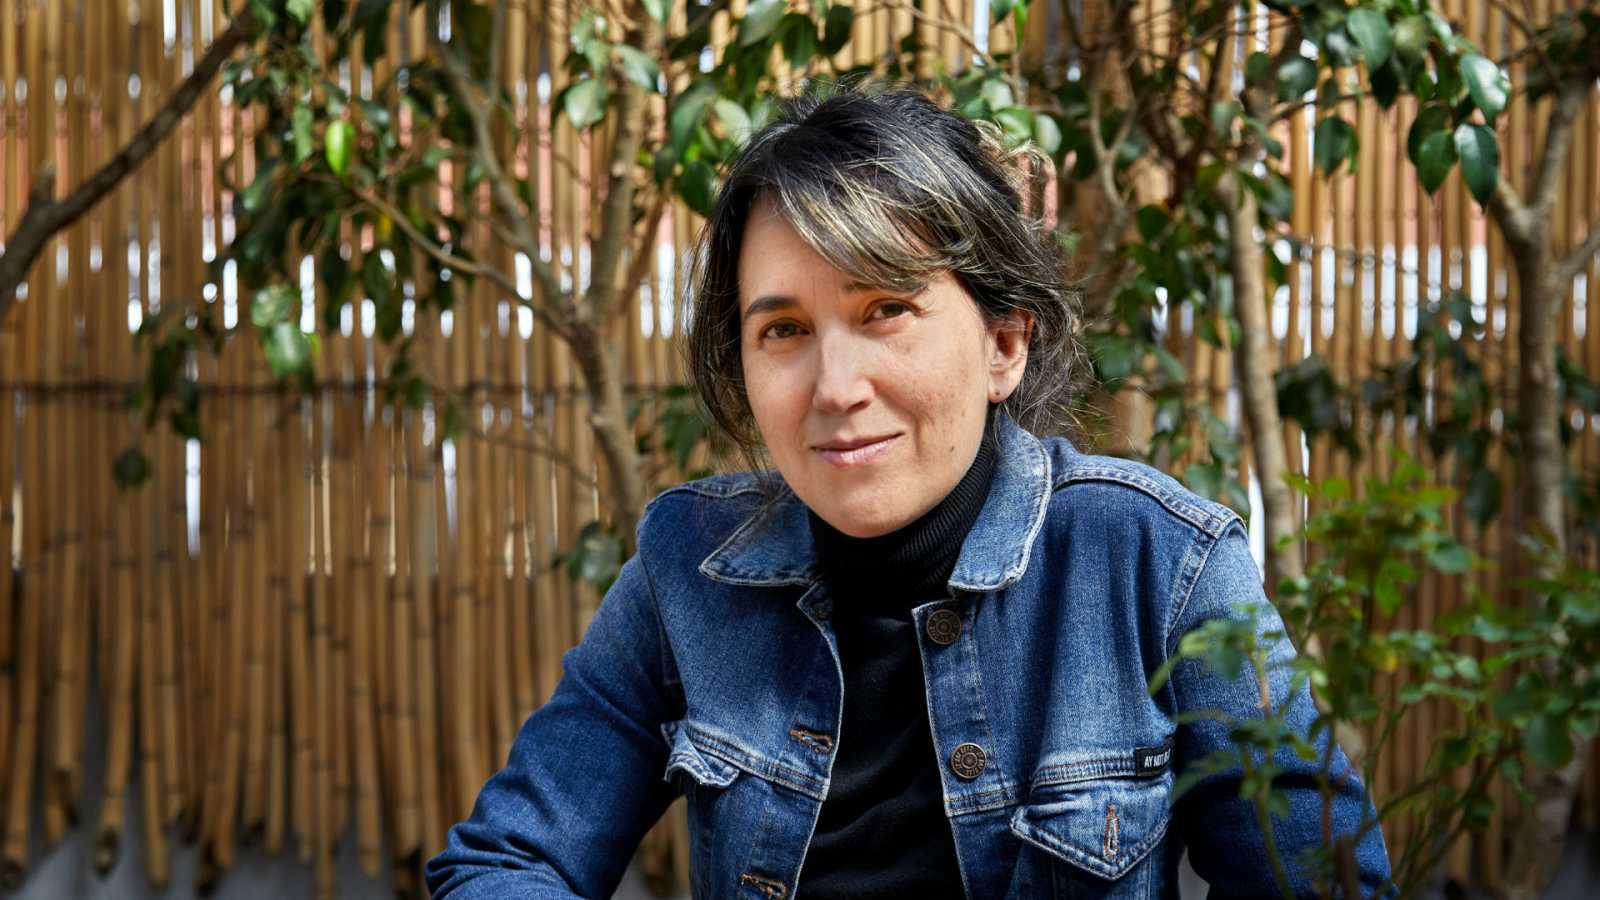 Libros de arena - Gabriela Ponce - 21/08/20 - escuchar ahora